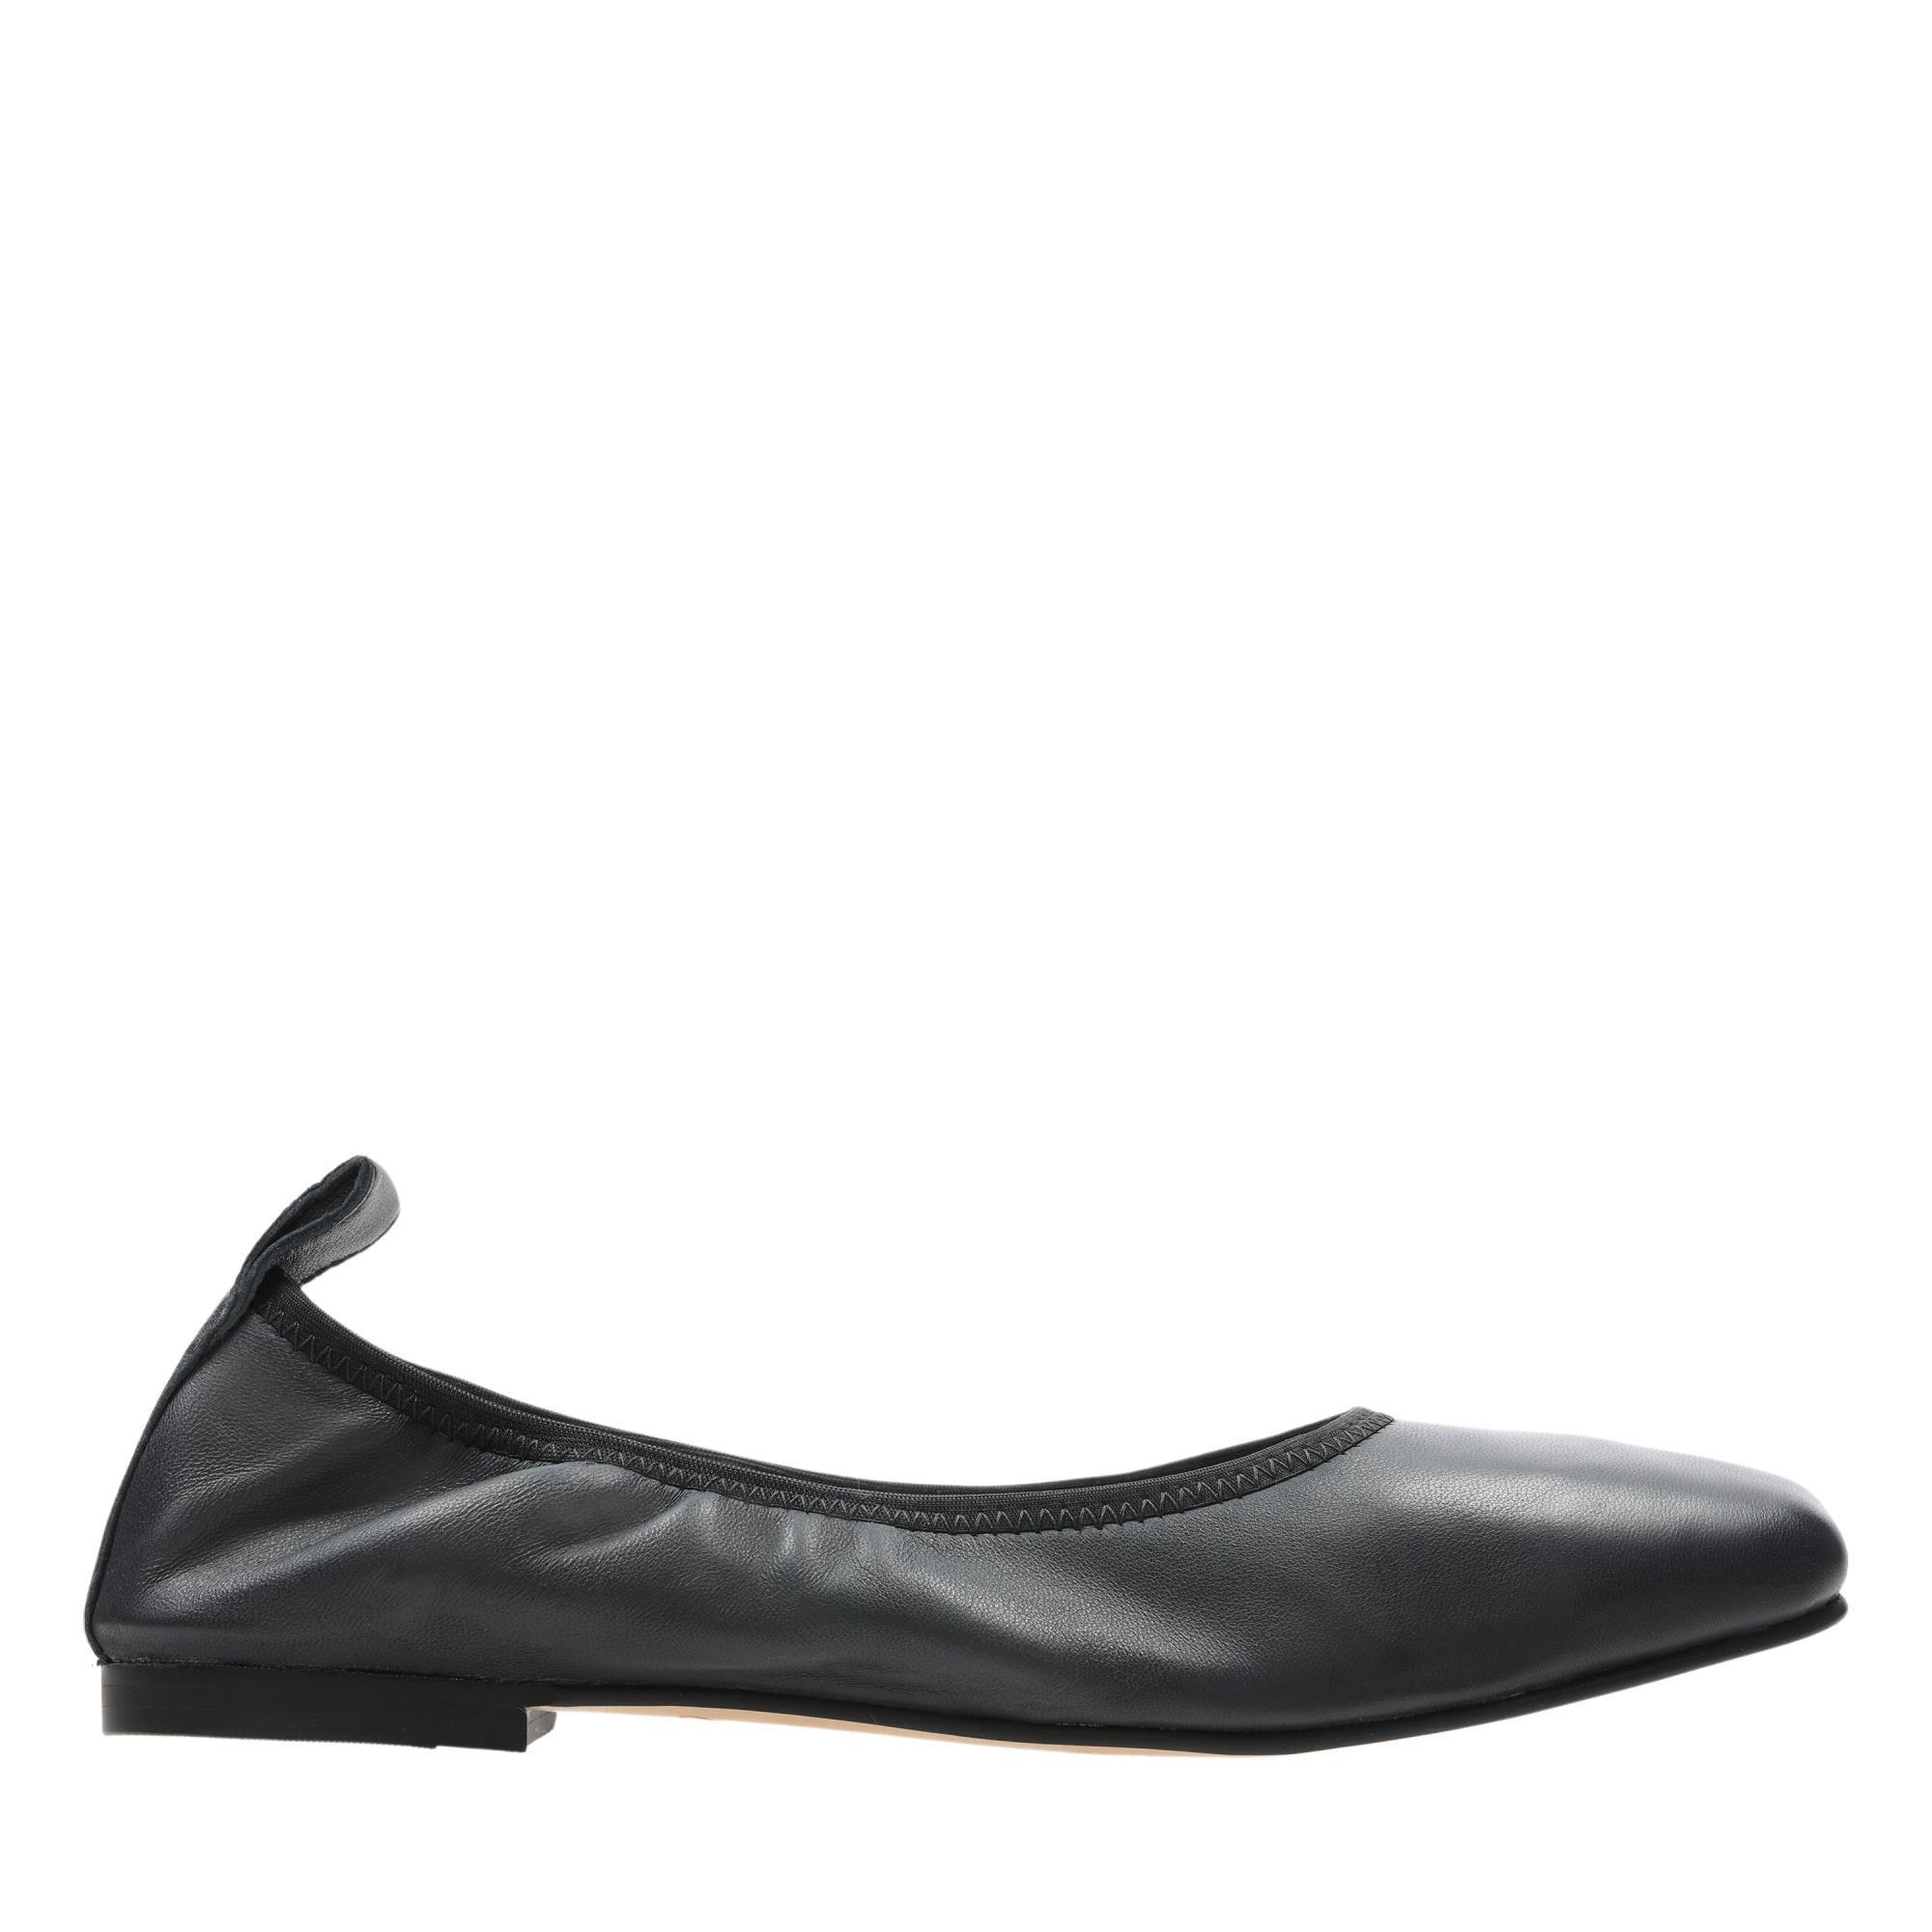 Clarks Pure Ballet 26158475 Black Leather